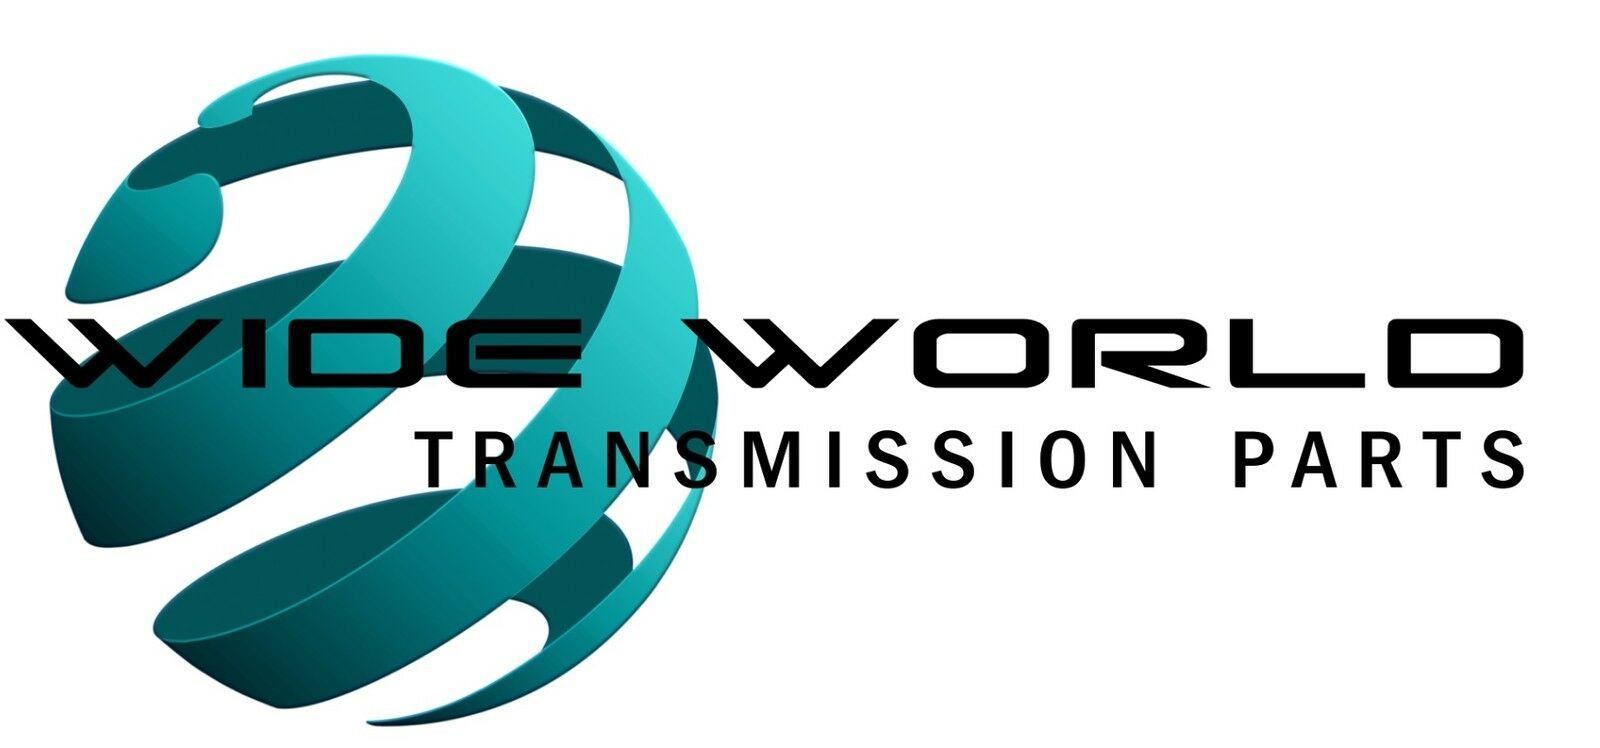 Wide World Transmission Parts